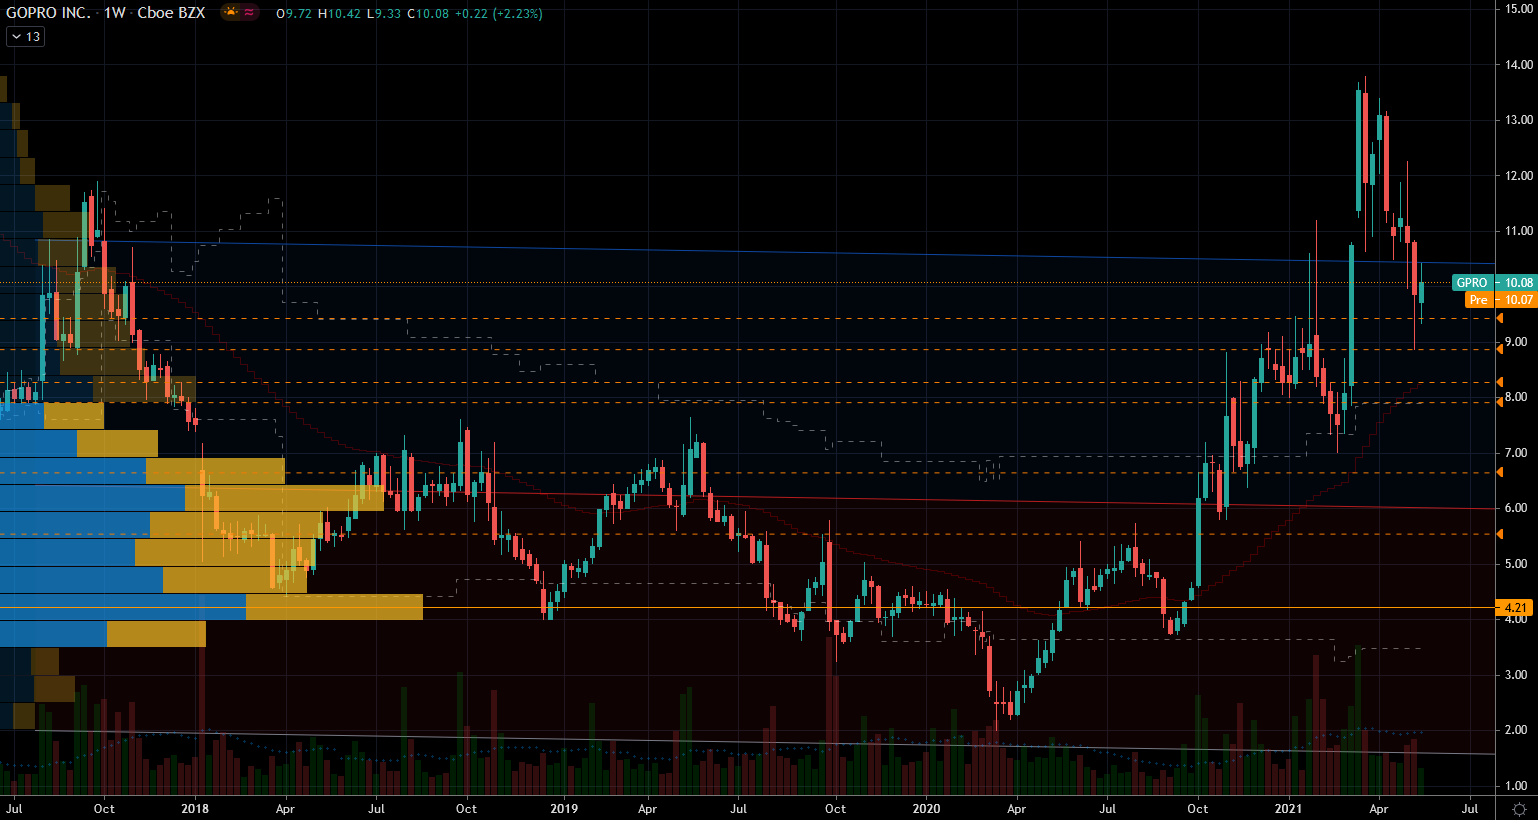 Pandemic Stocks: GoPro (GPRO) Stock Chart Showing Potential Base